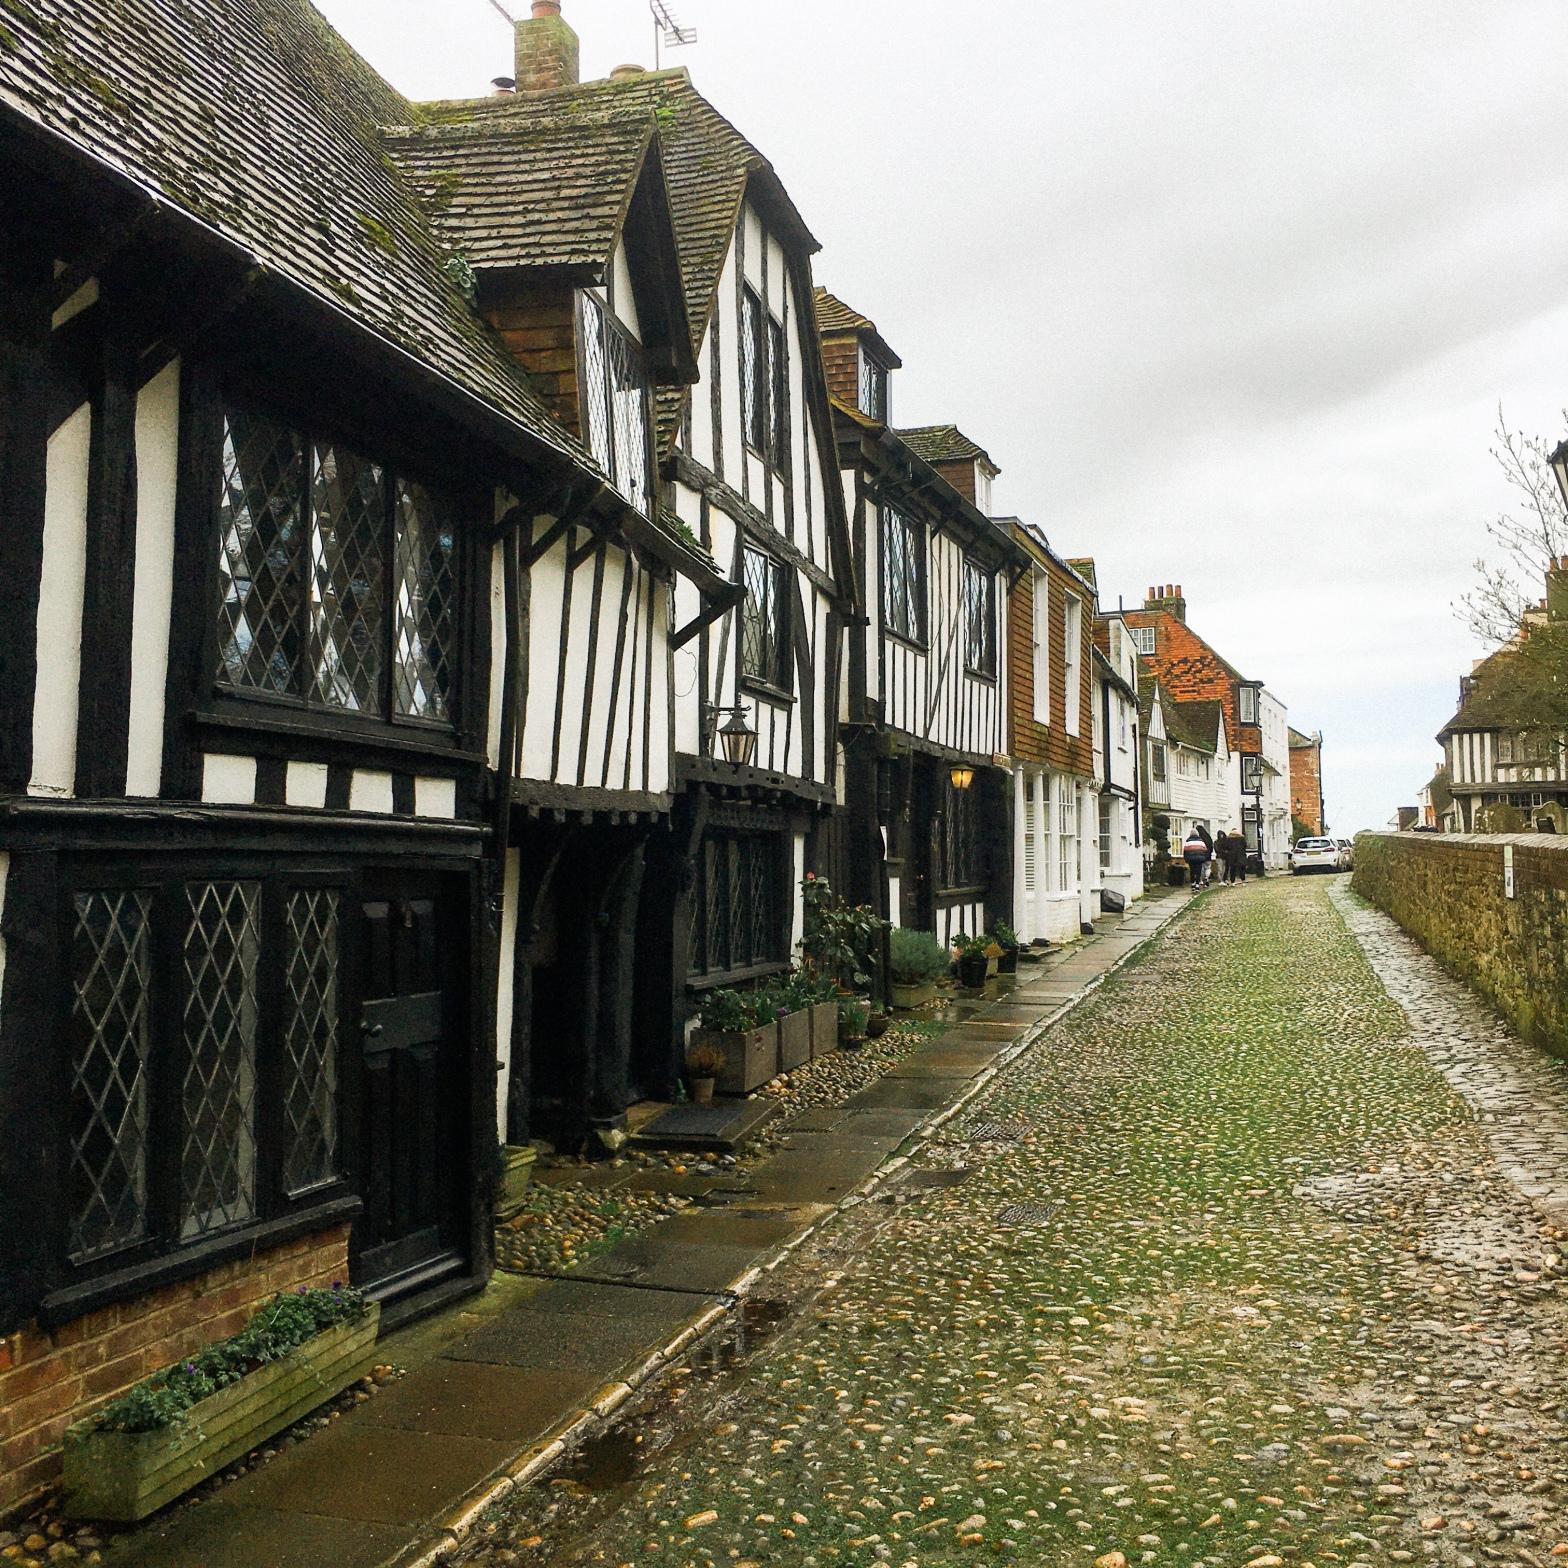 Cobbled street in Rye